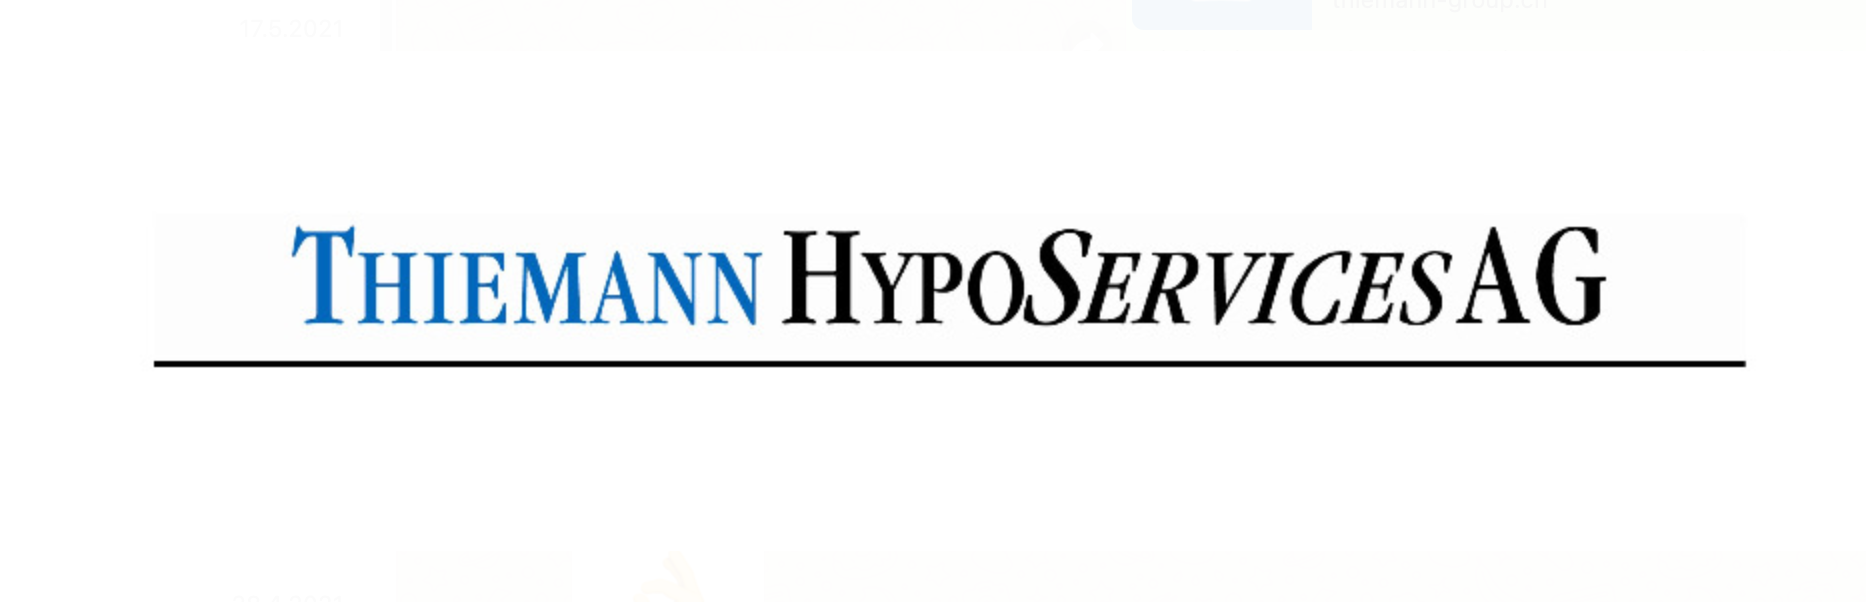 Thiemann HypoServices AG | Altes Logo